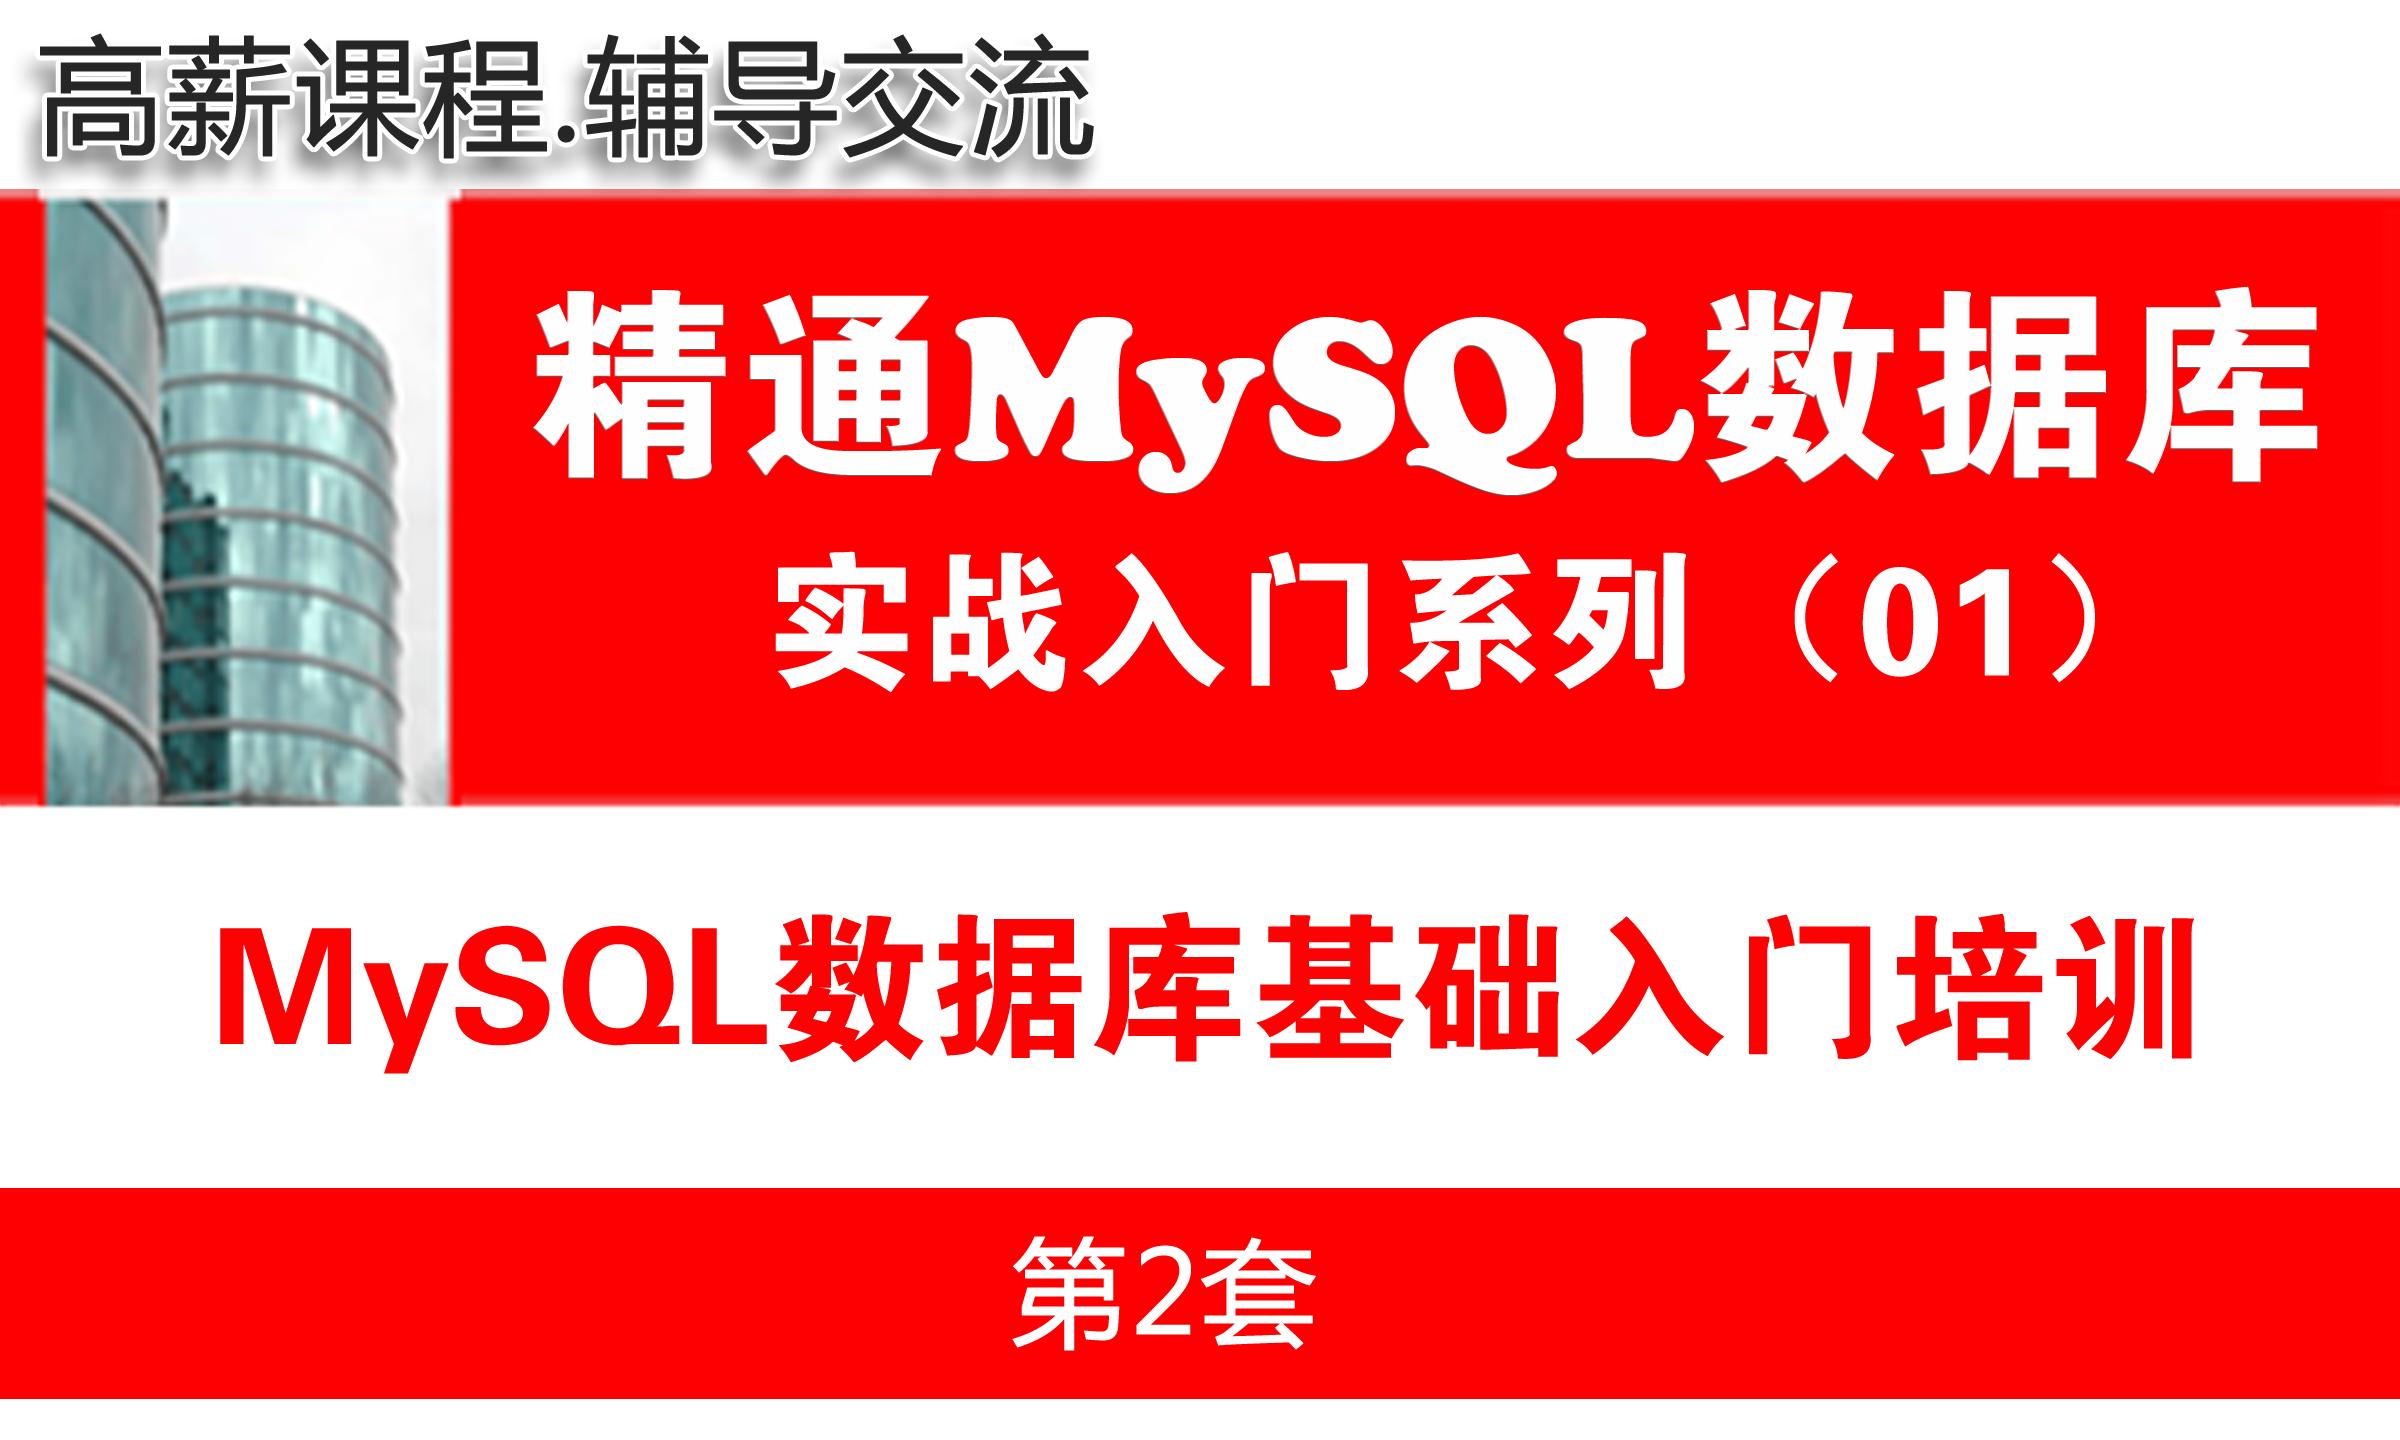 MySQL数据库基础入门培训视频课程_MySQL数据库基础与项目实战01